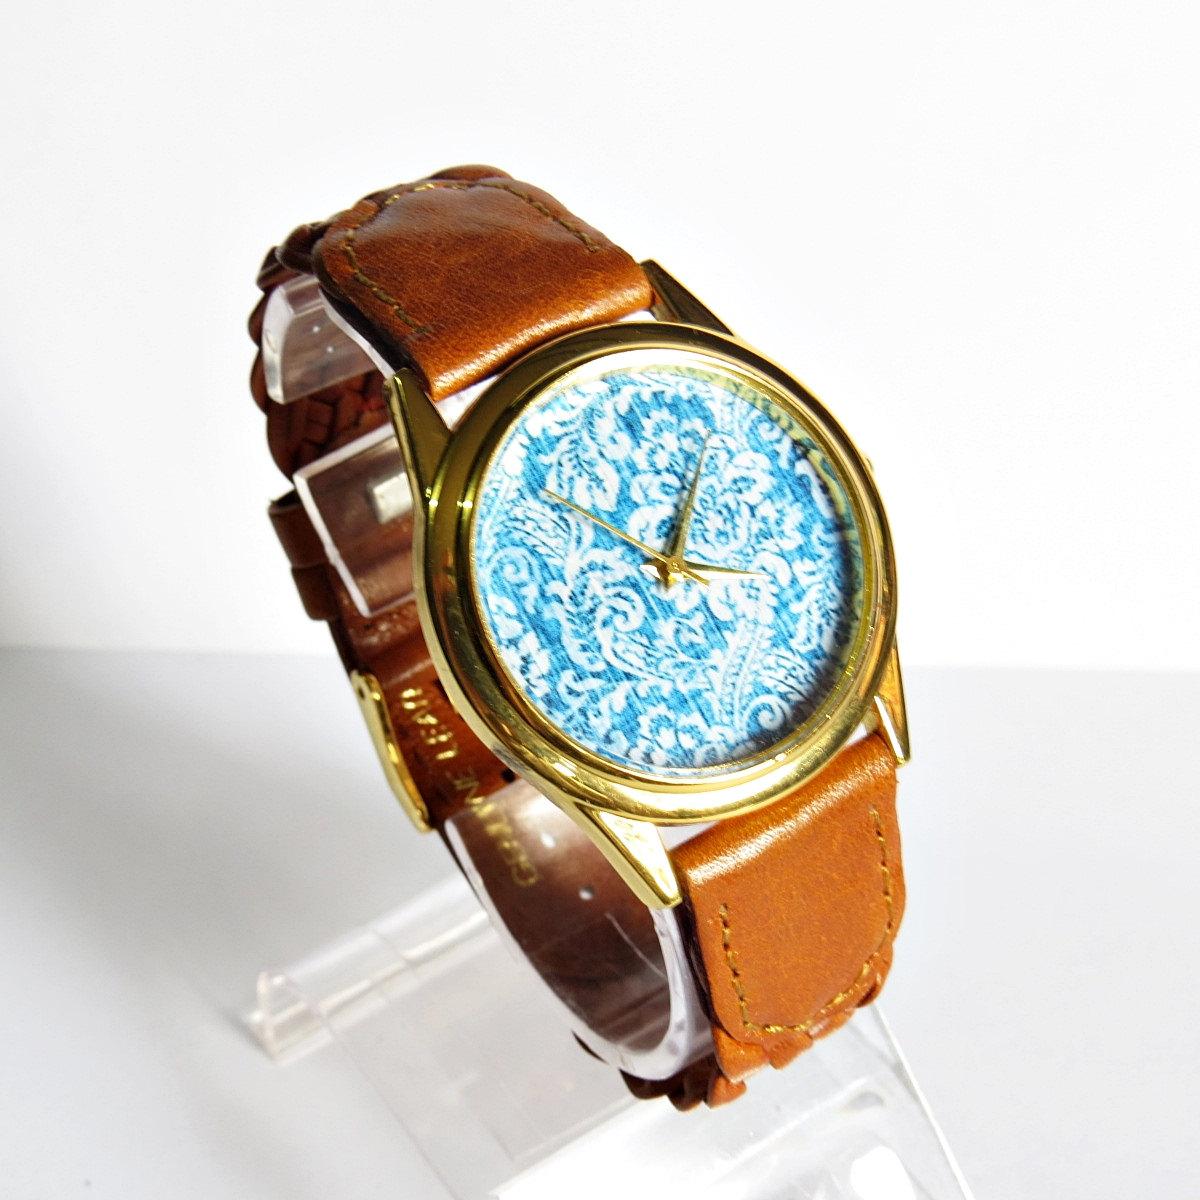 Perfect Denim Watch, Vintage Style Leather Watch, Women Watches, Ladies Watch, Genuine Braided Leather